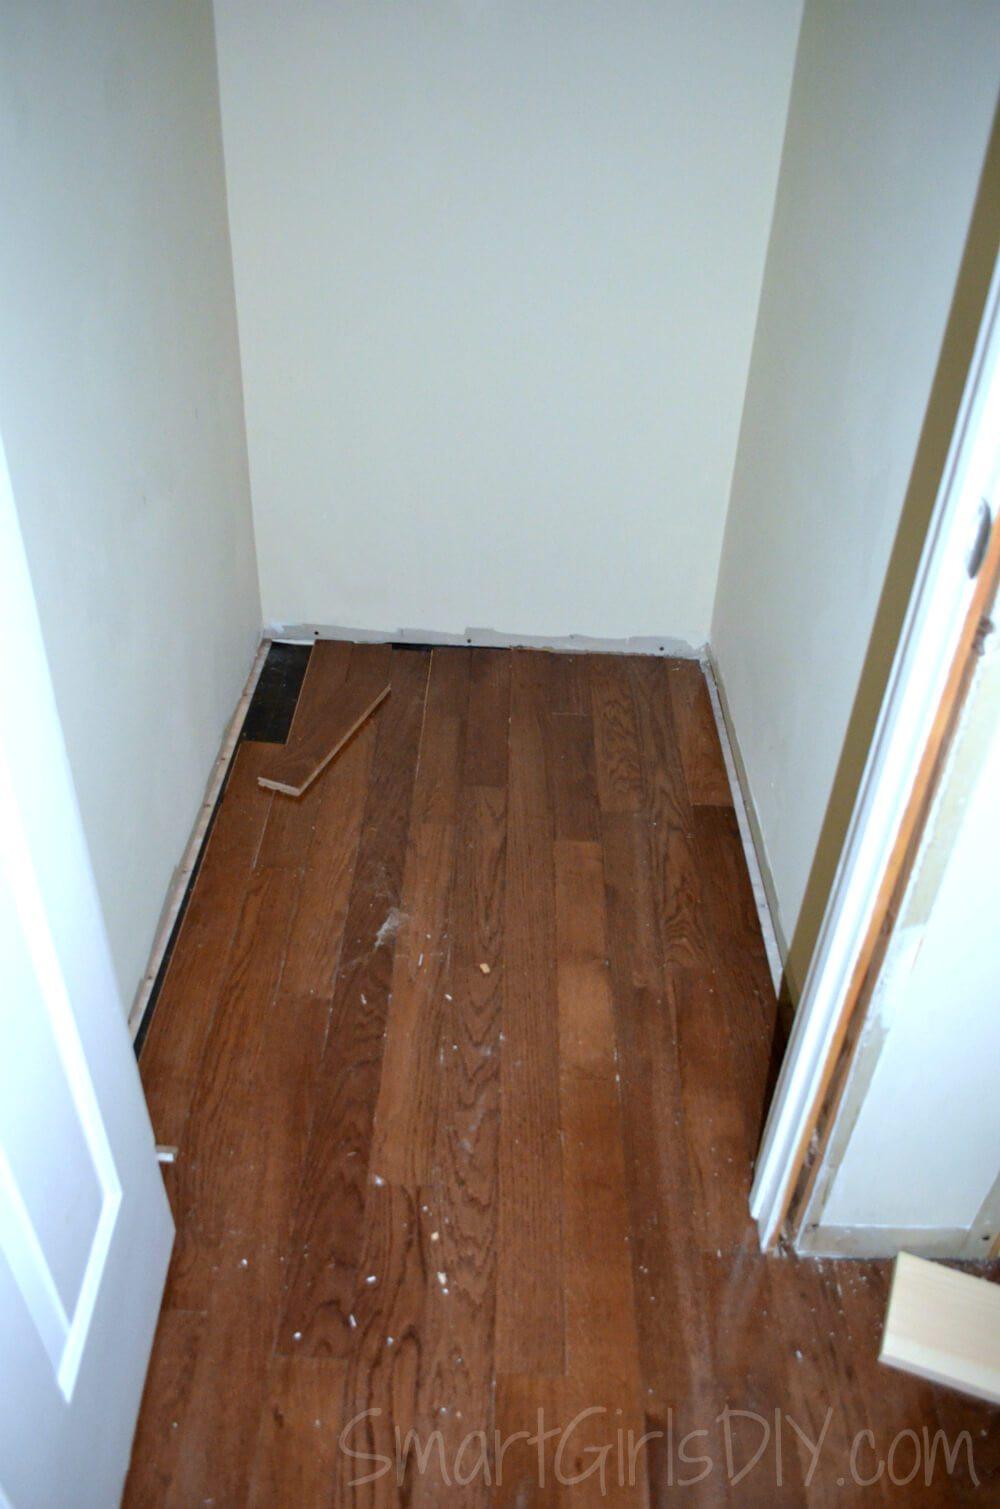 5 8 solid hardwood flooring of upstairs hallway 1 installing hardwood floors throughout hardwood extends into closet